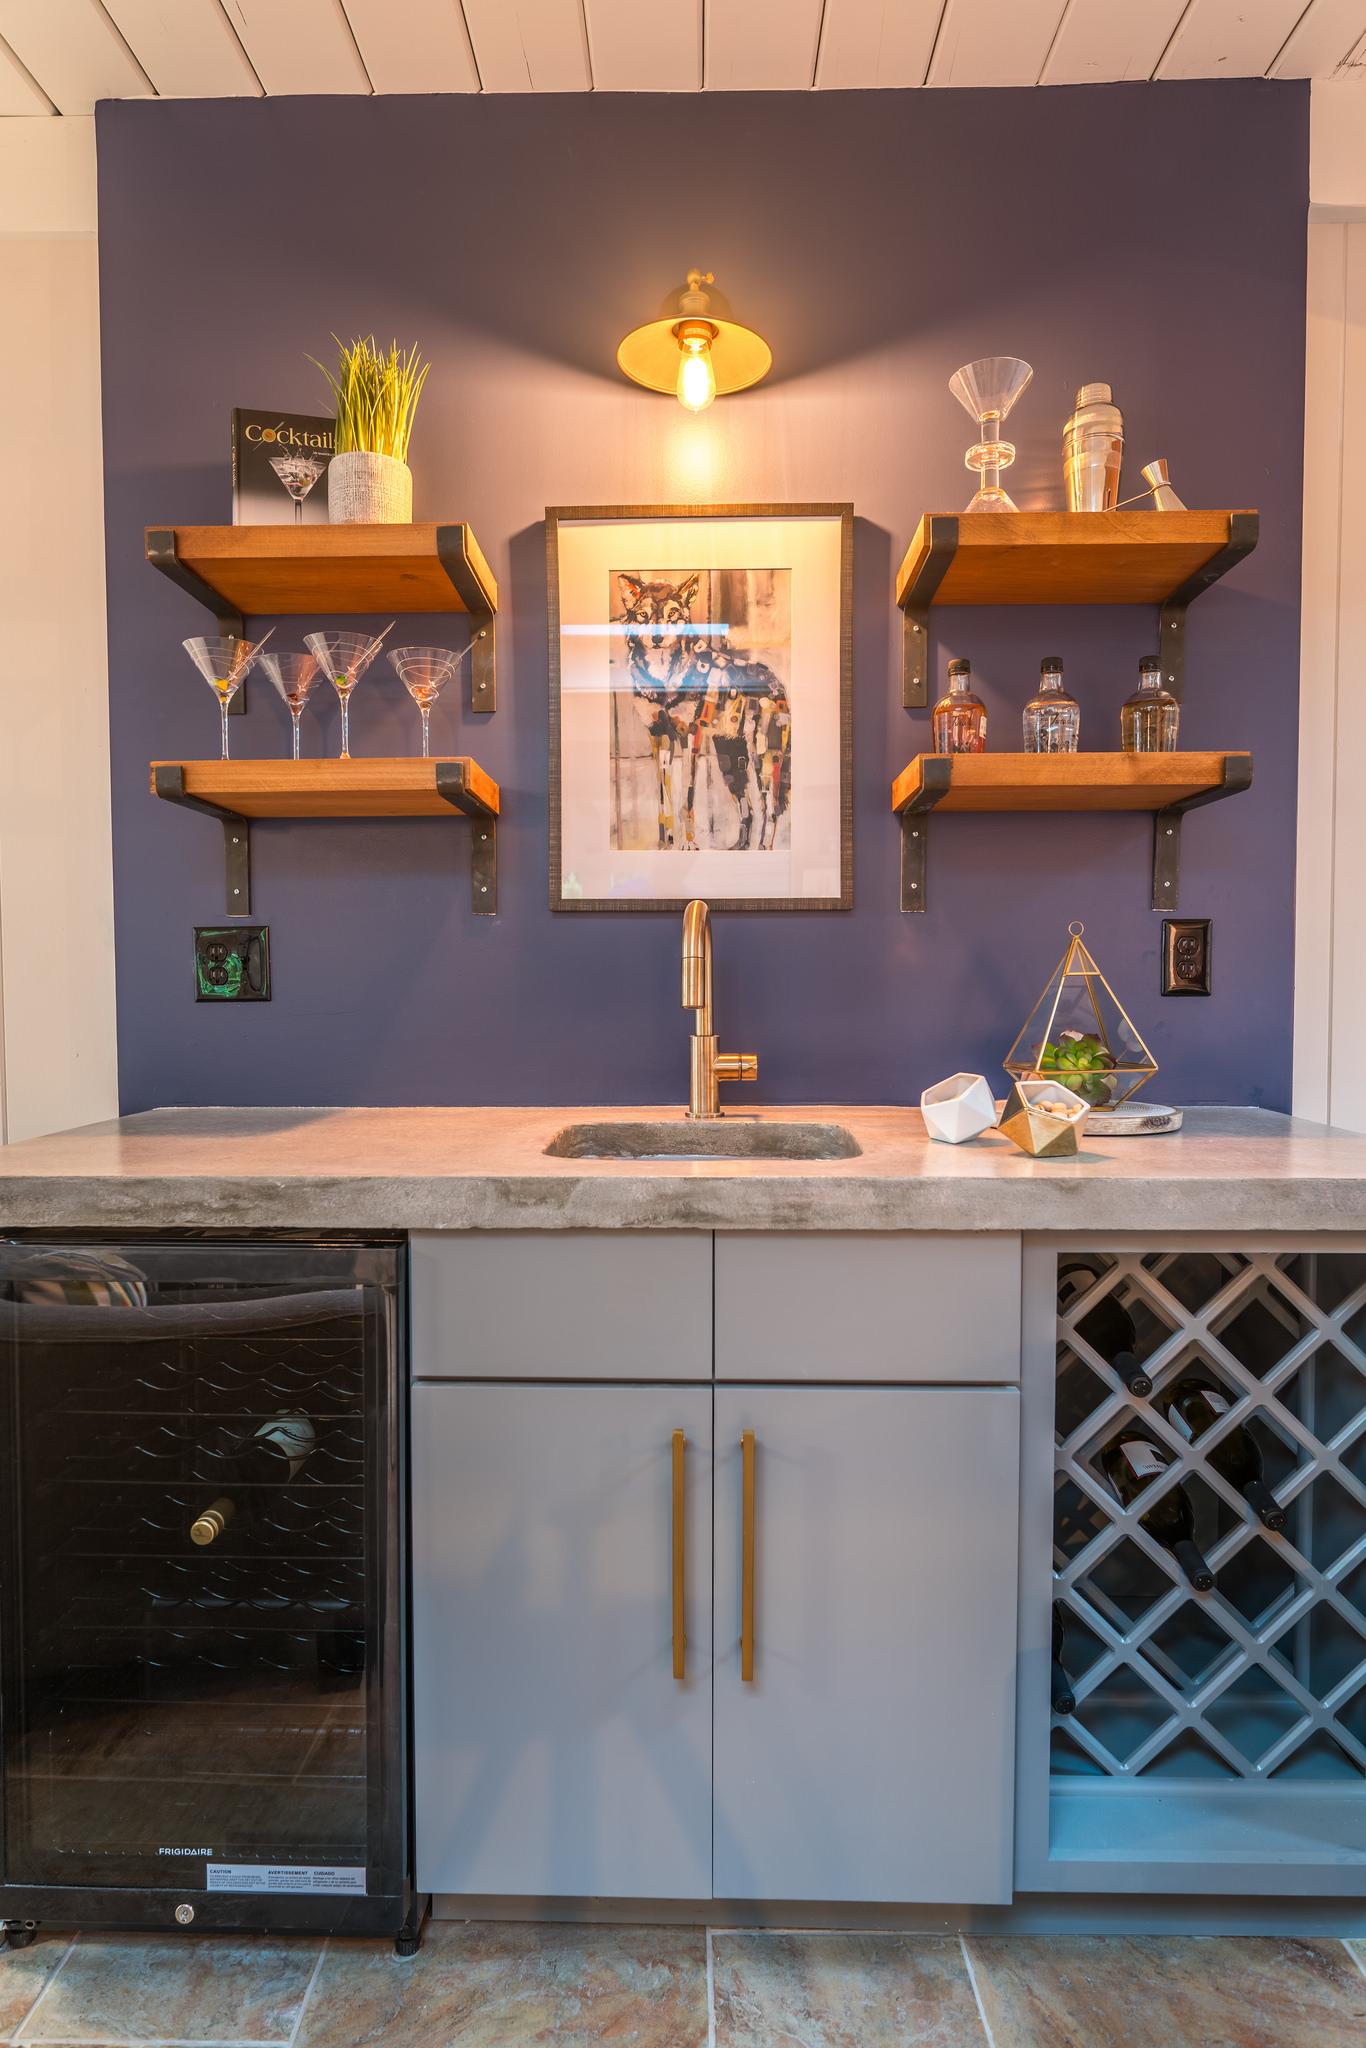 Custom wet bar with beverage fridge and wine rack